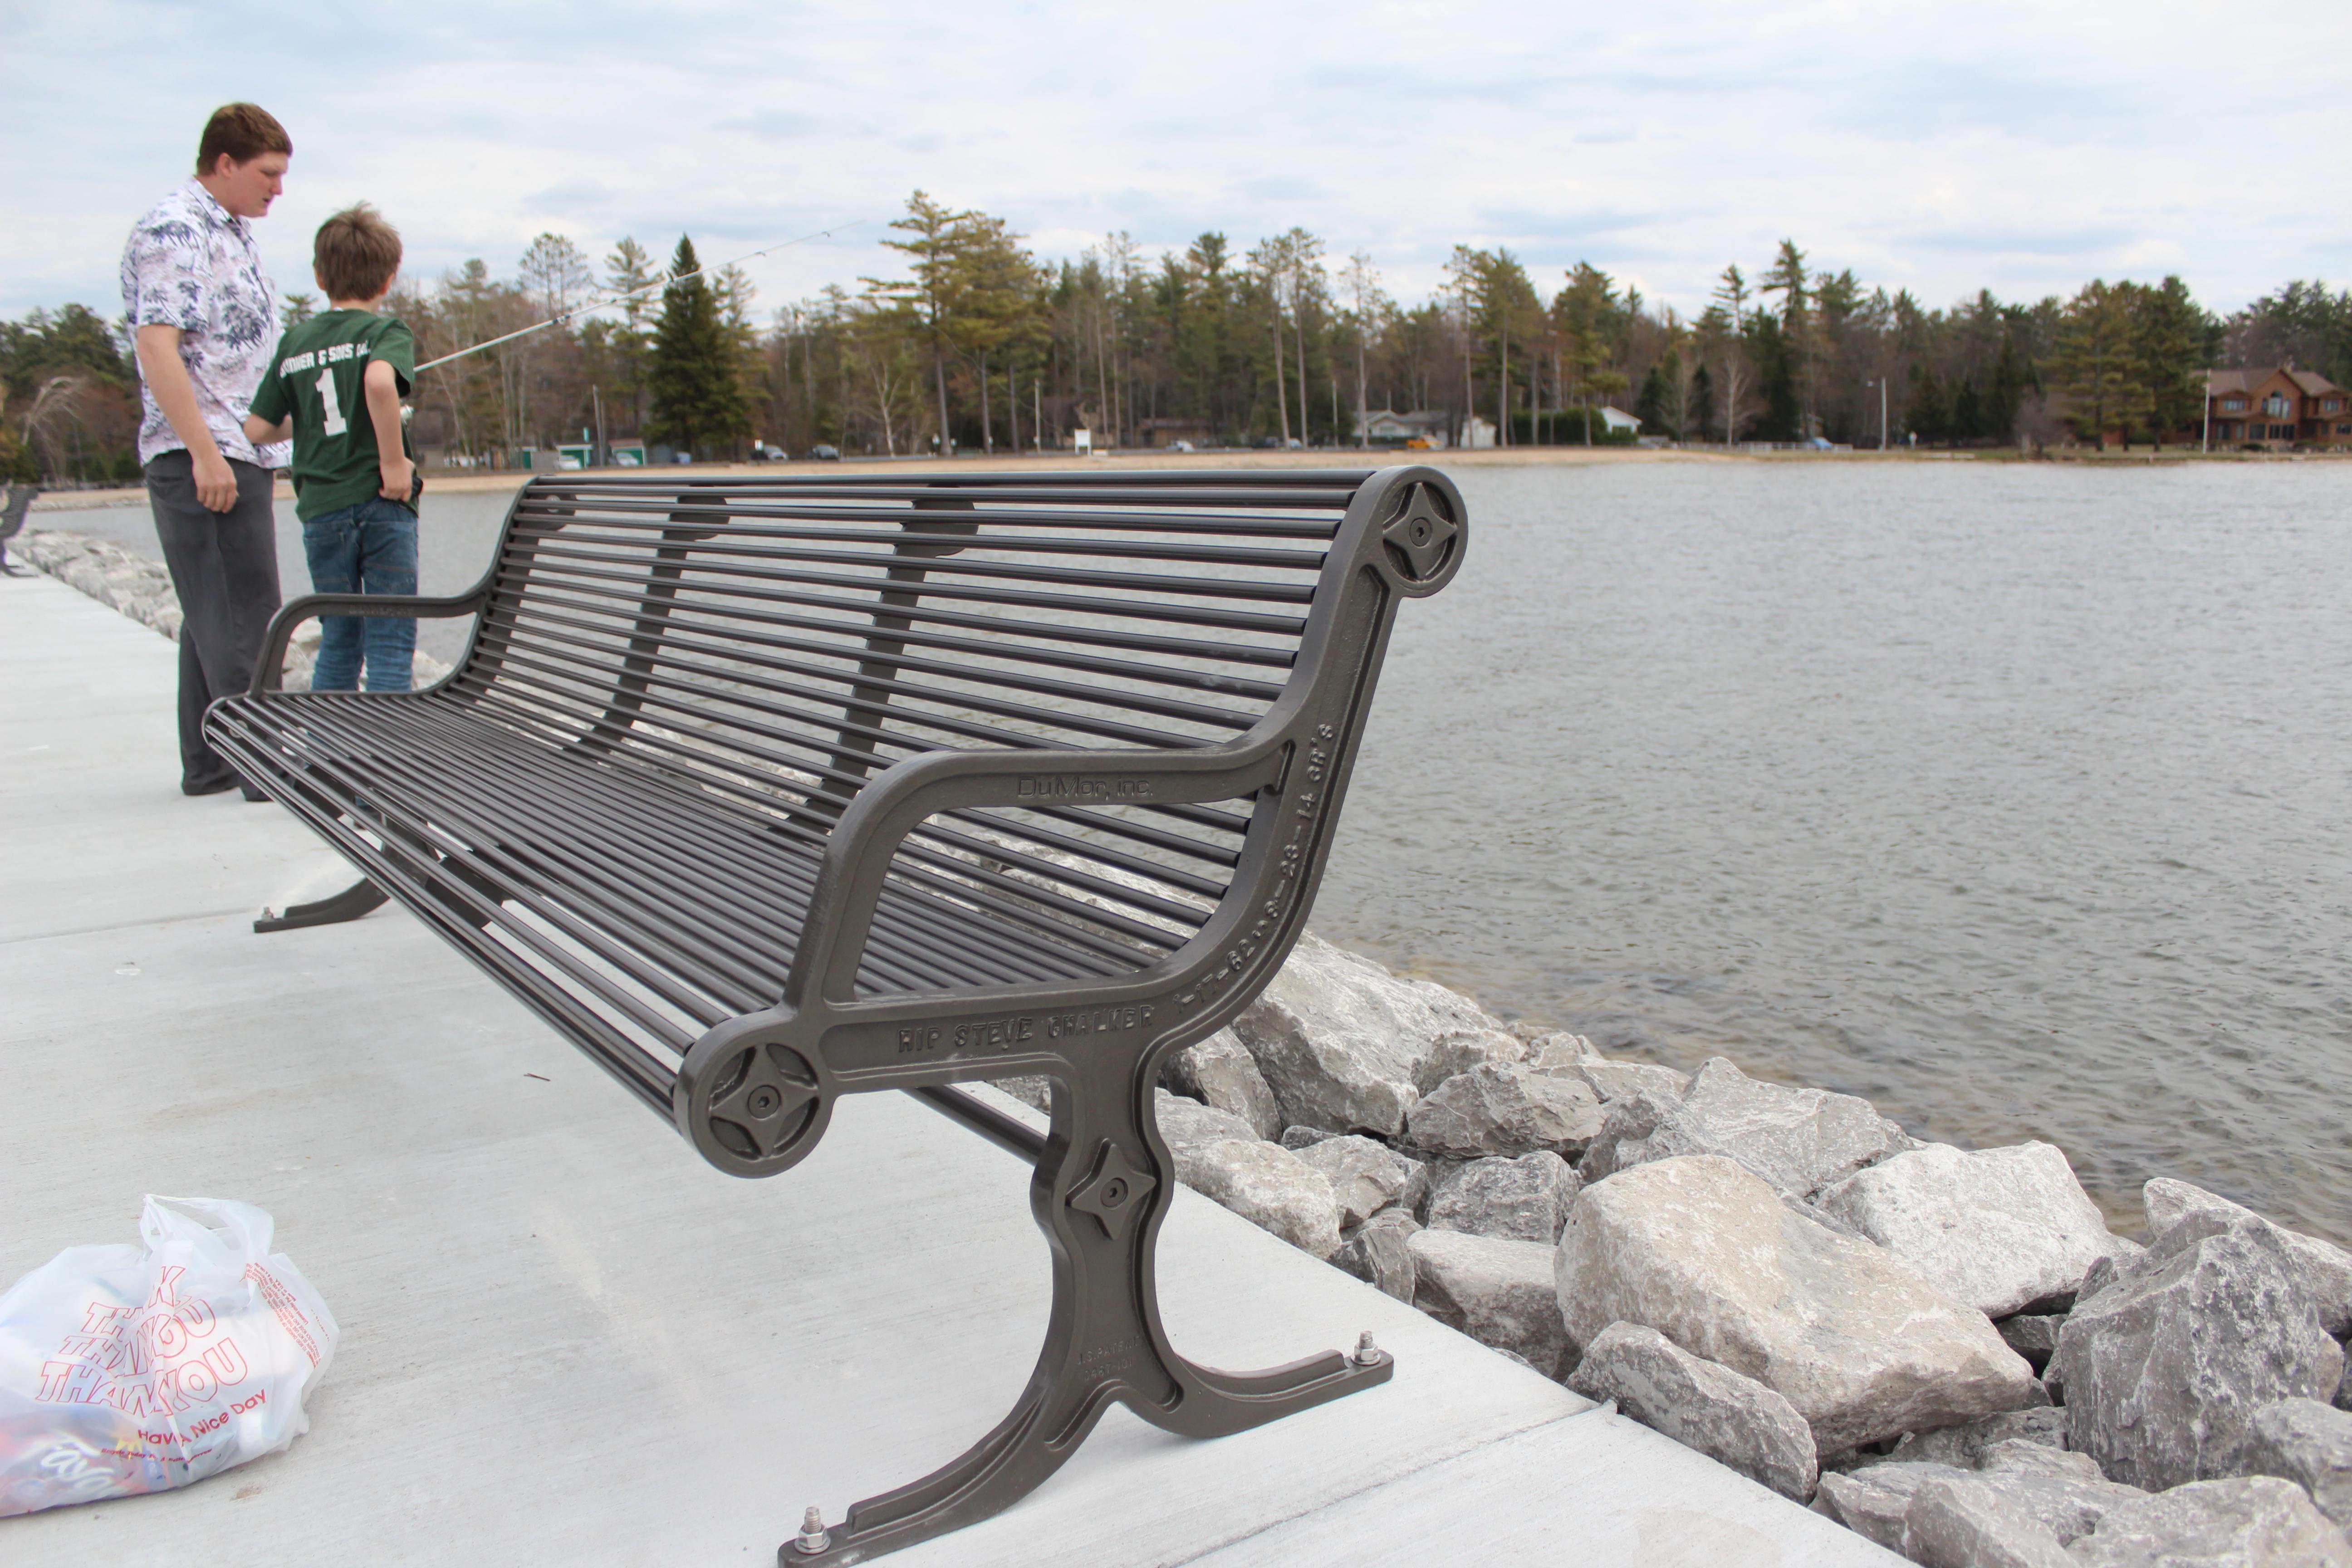 Tuscaroroa-county-parks-bench